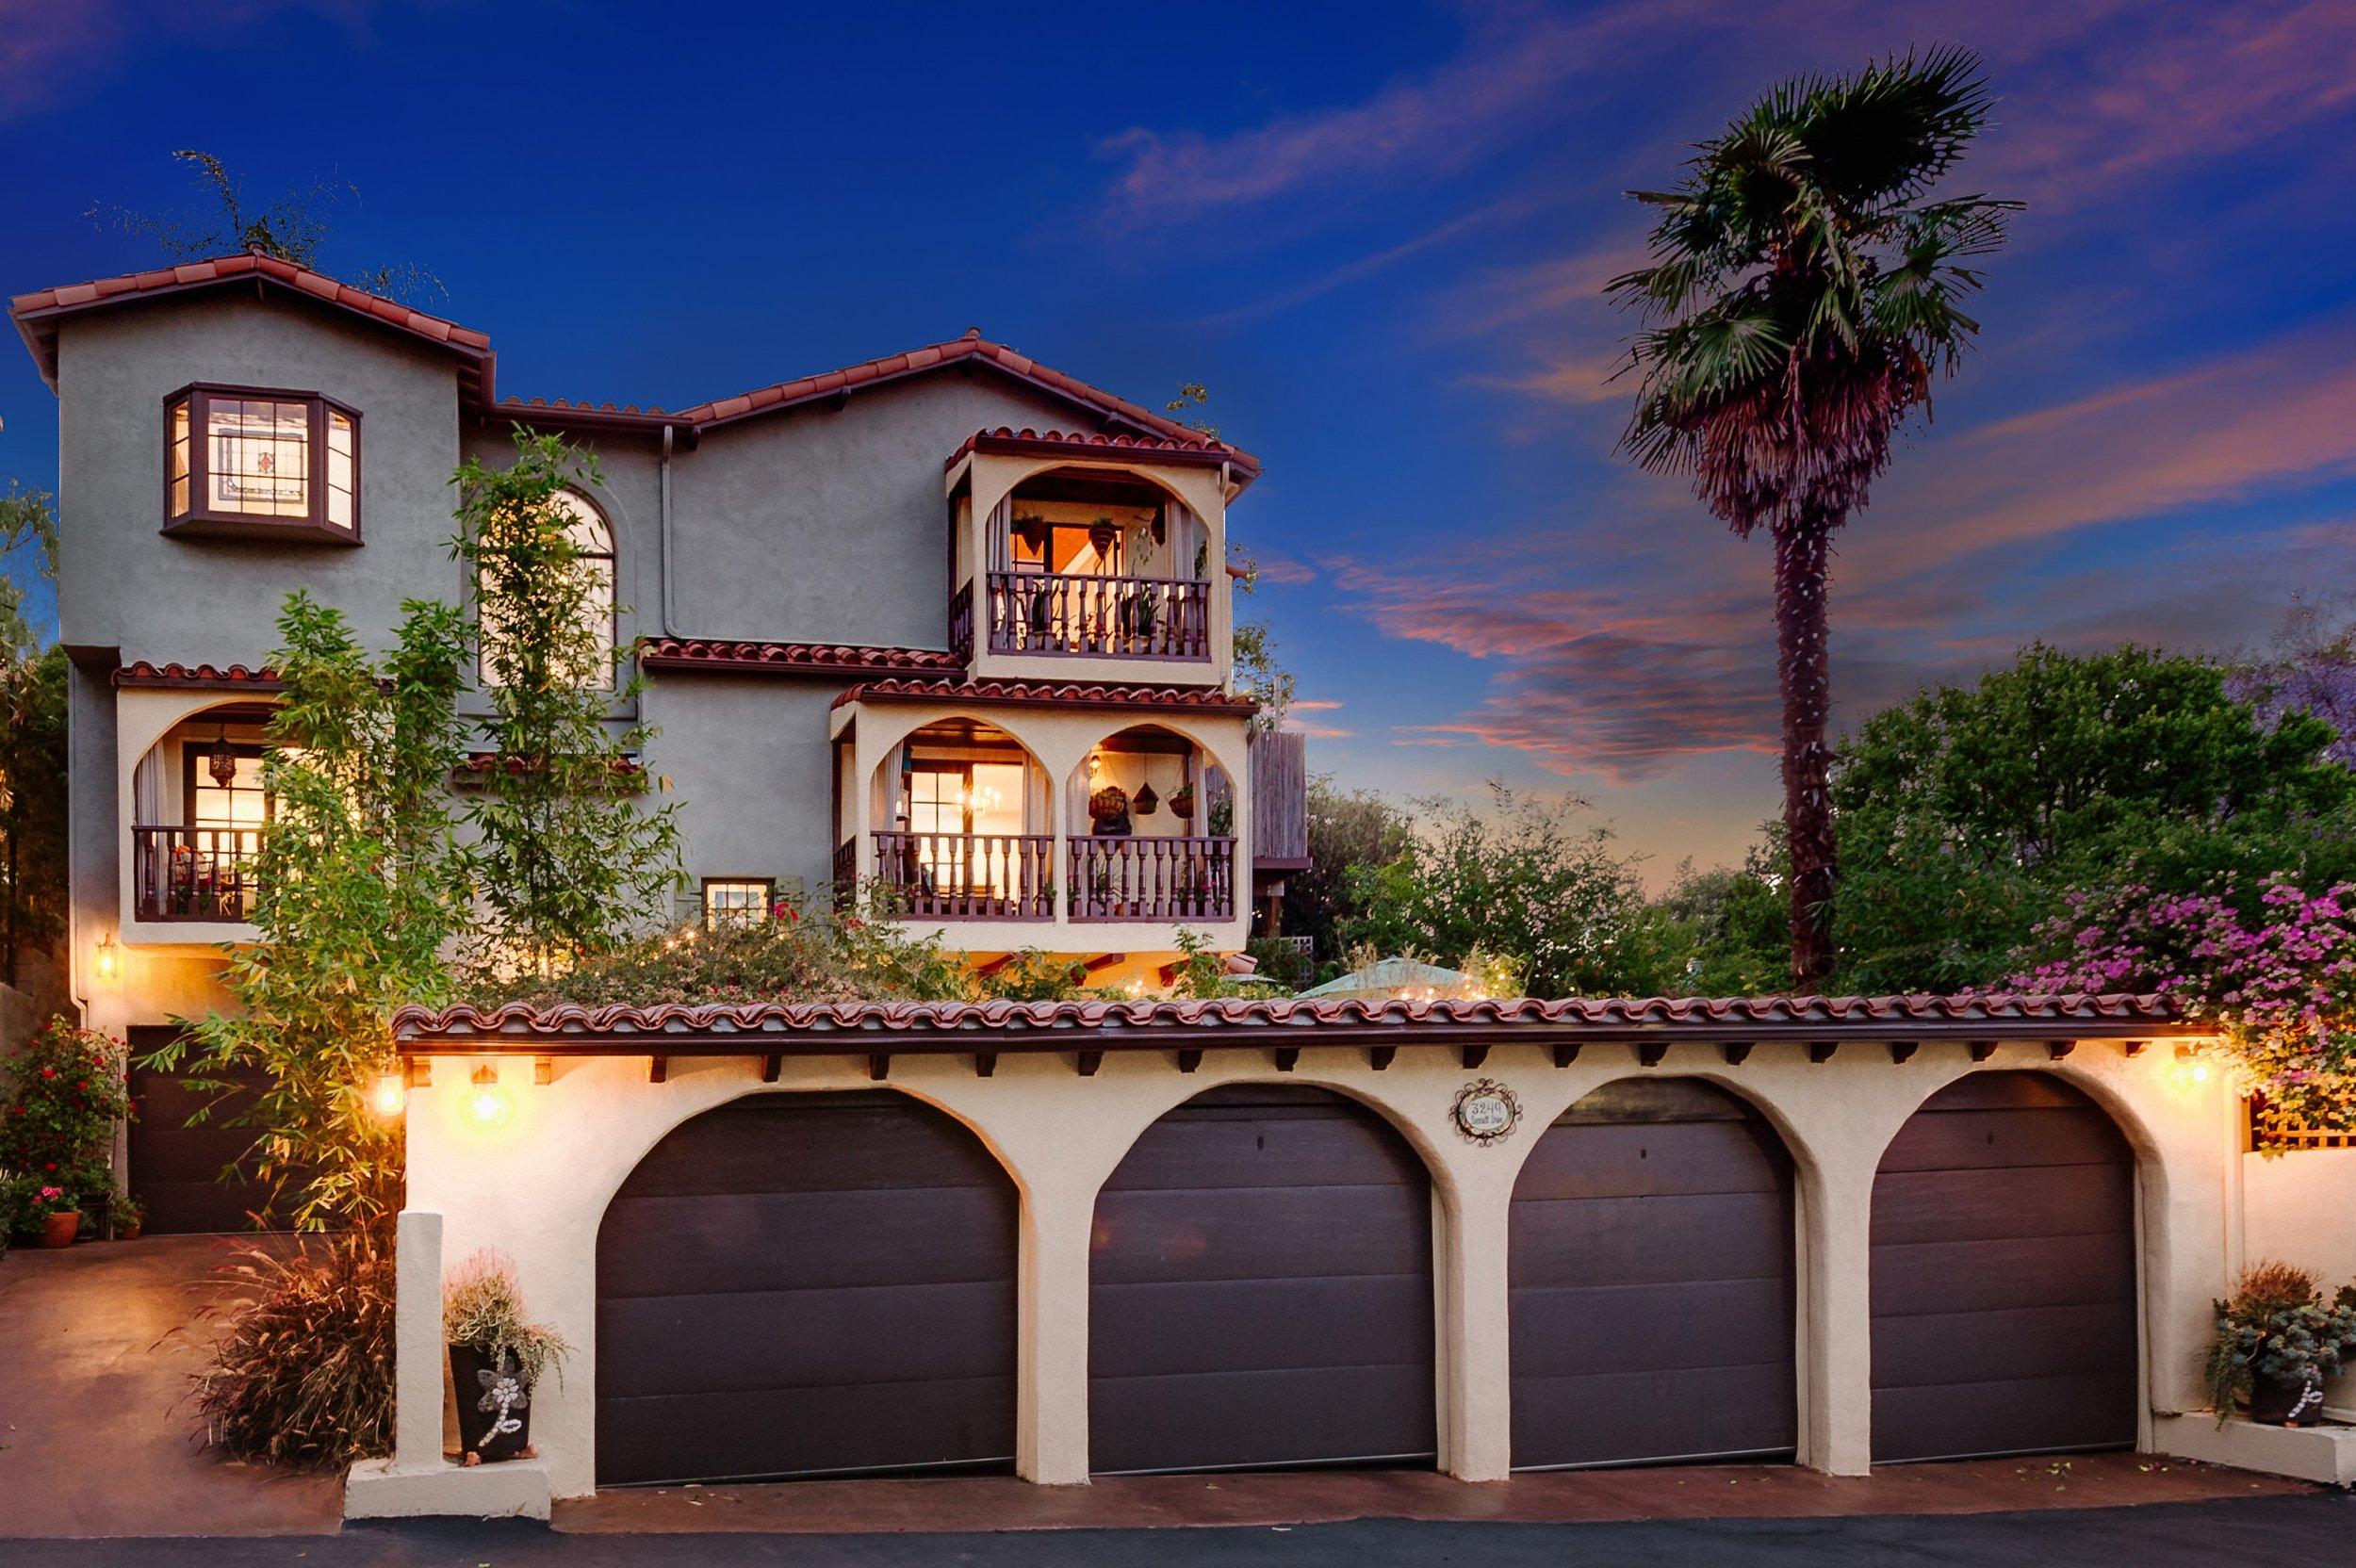 3247 BENNETT | $1,711,000 | HOLLYWOOD HILLS